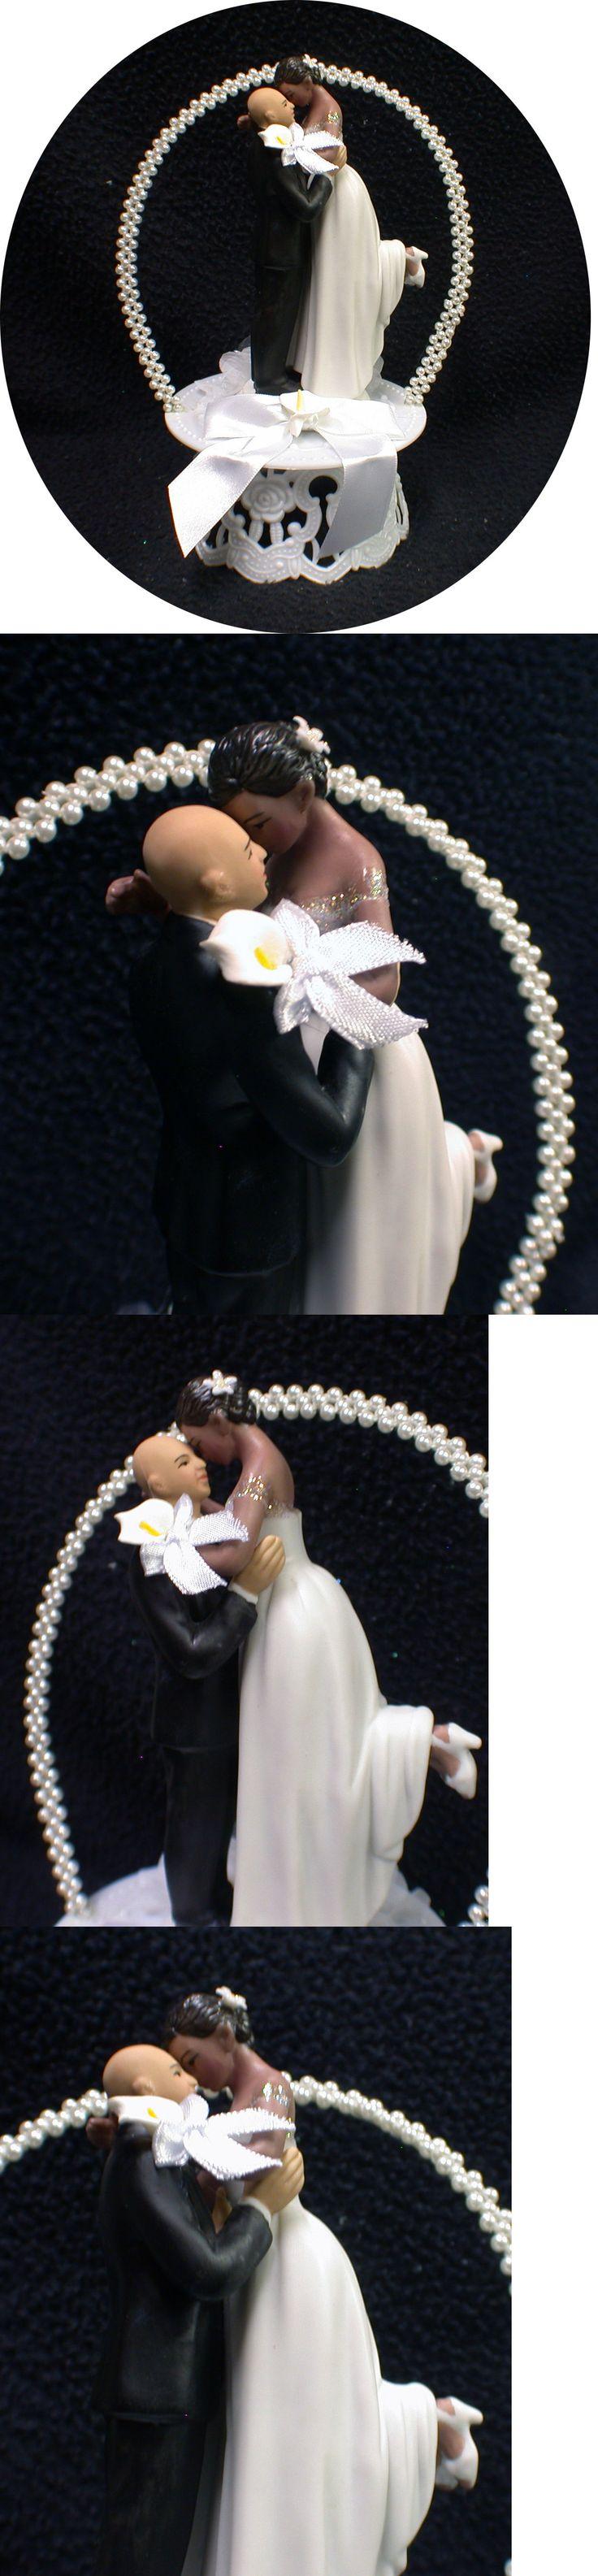 The 25 best African wedding cakes ideas on Pinterest